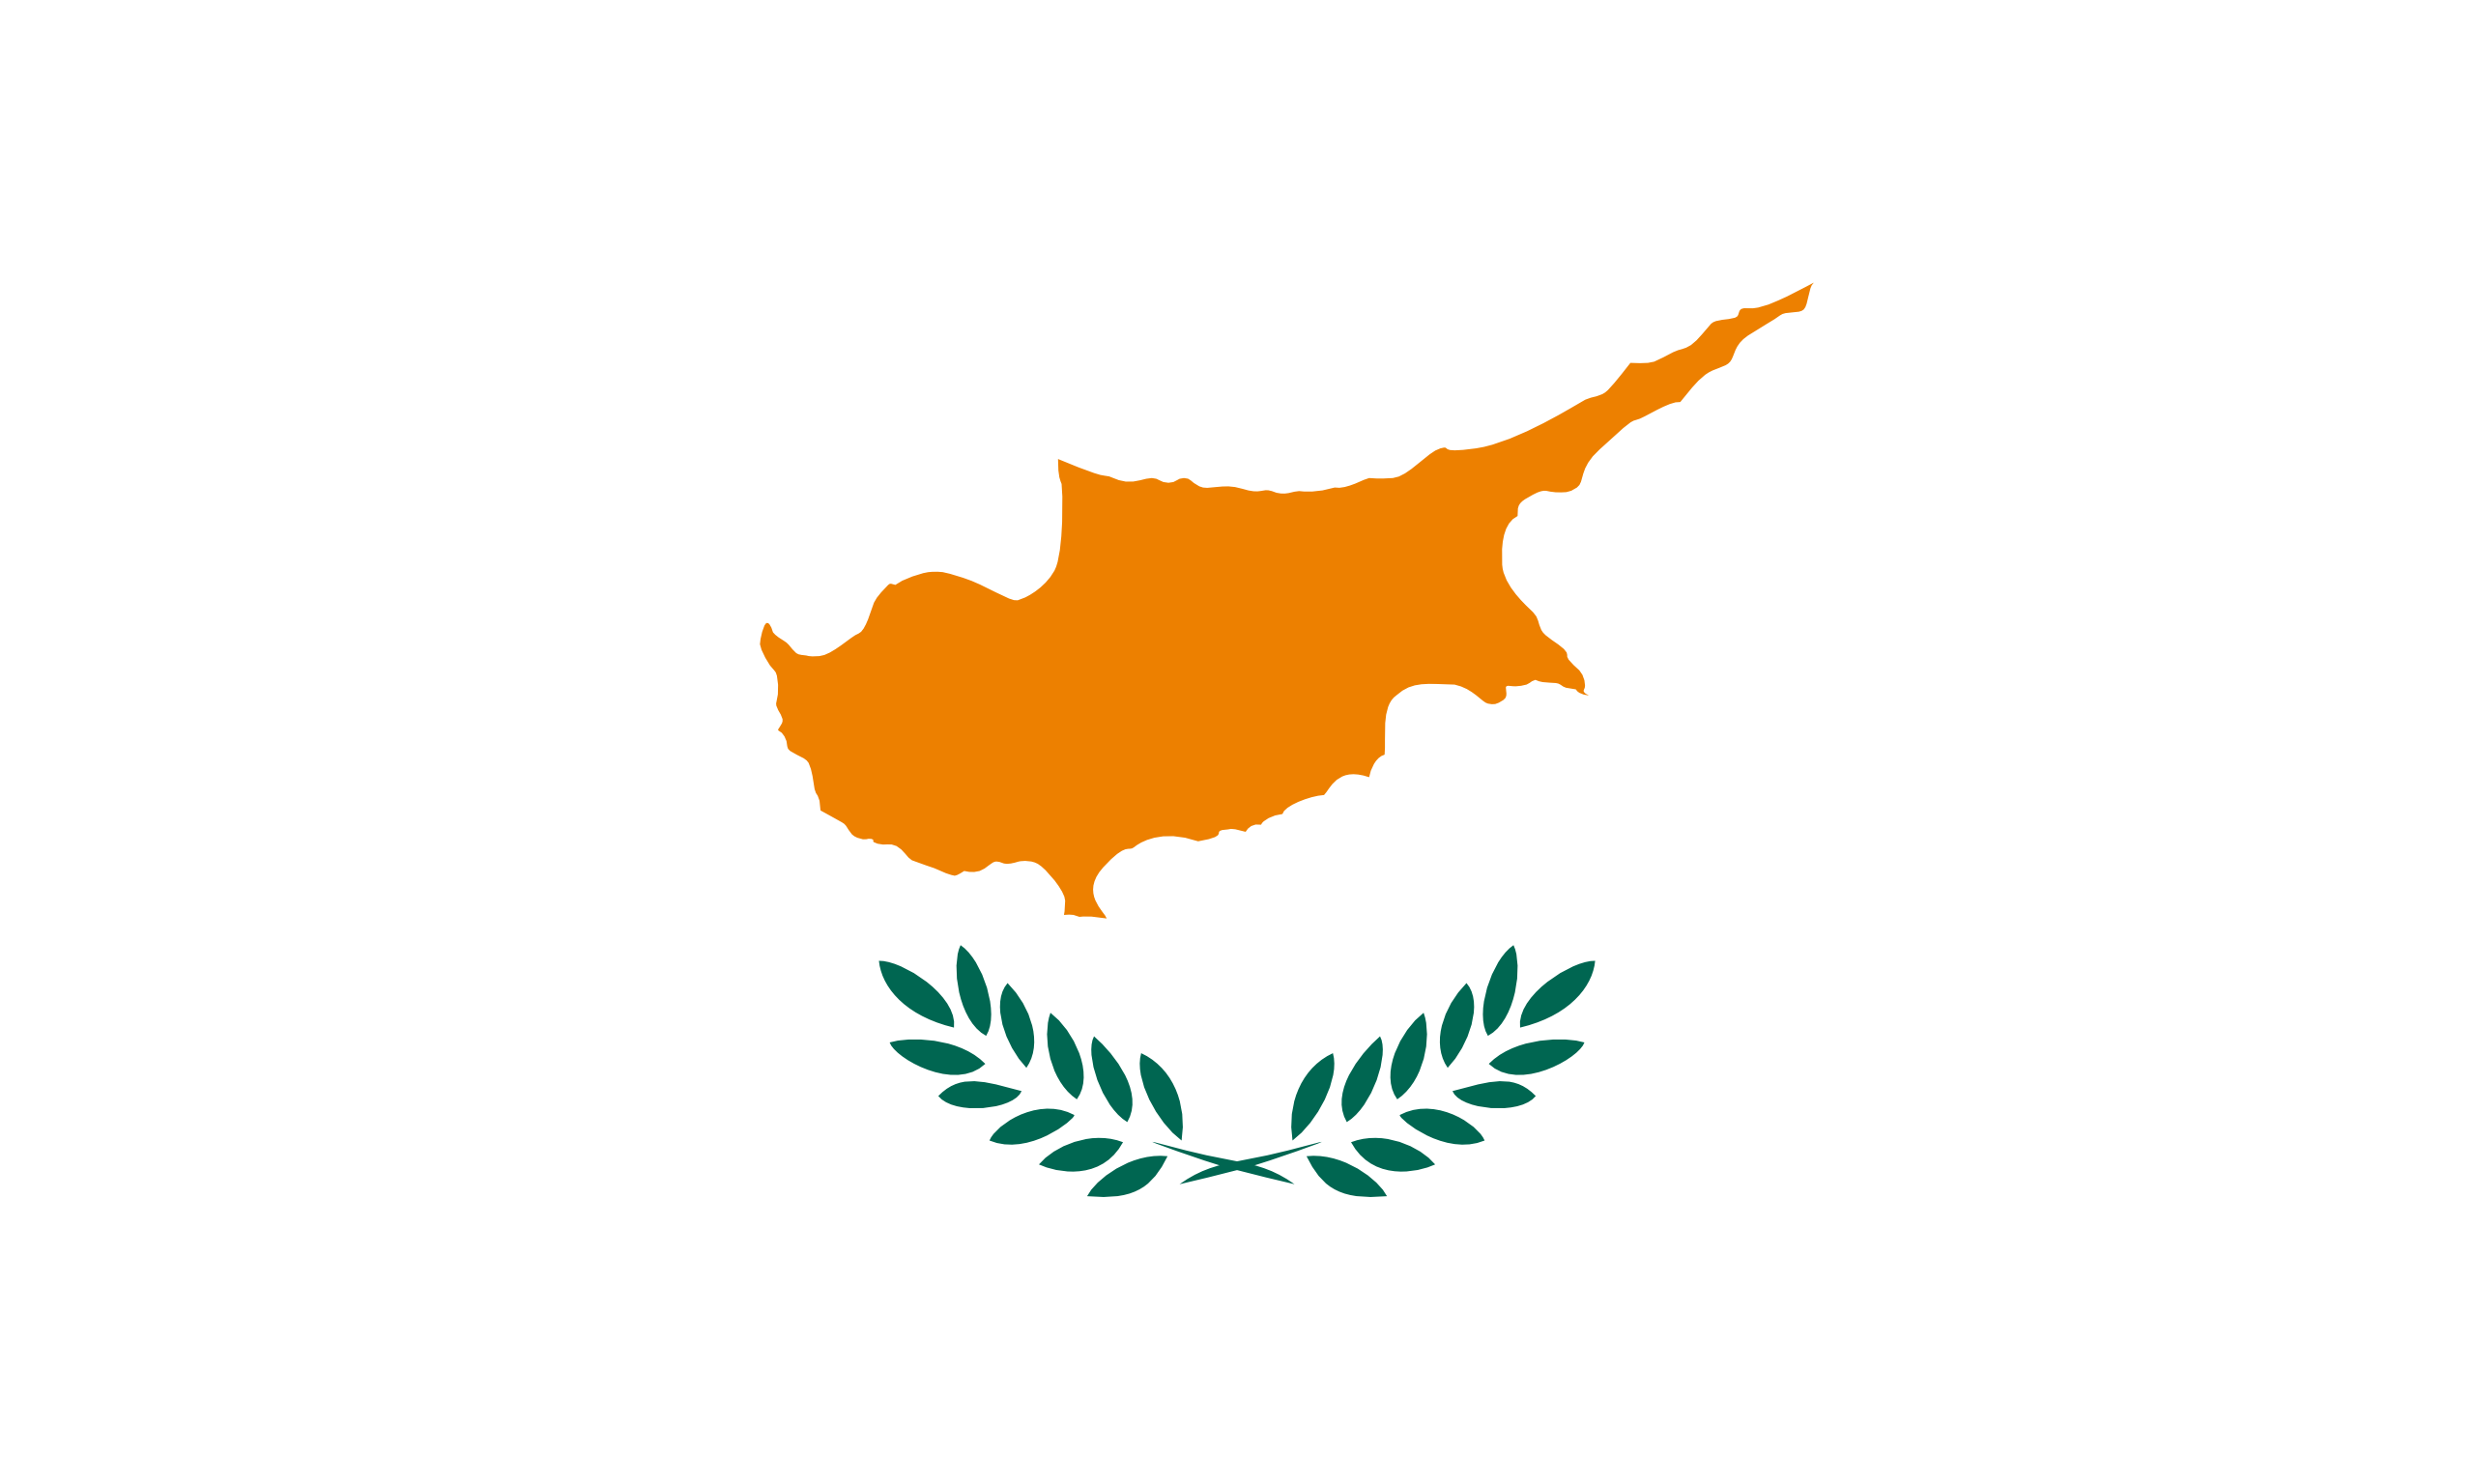 साइप्रस, देश, emblema, लोग�प्रतीकbolo - HD वॉलपेपर - प्रोफेसर-falken.com